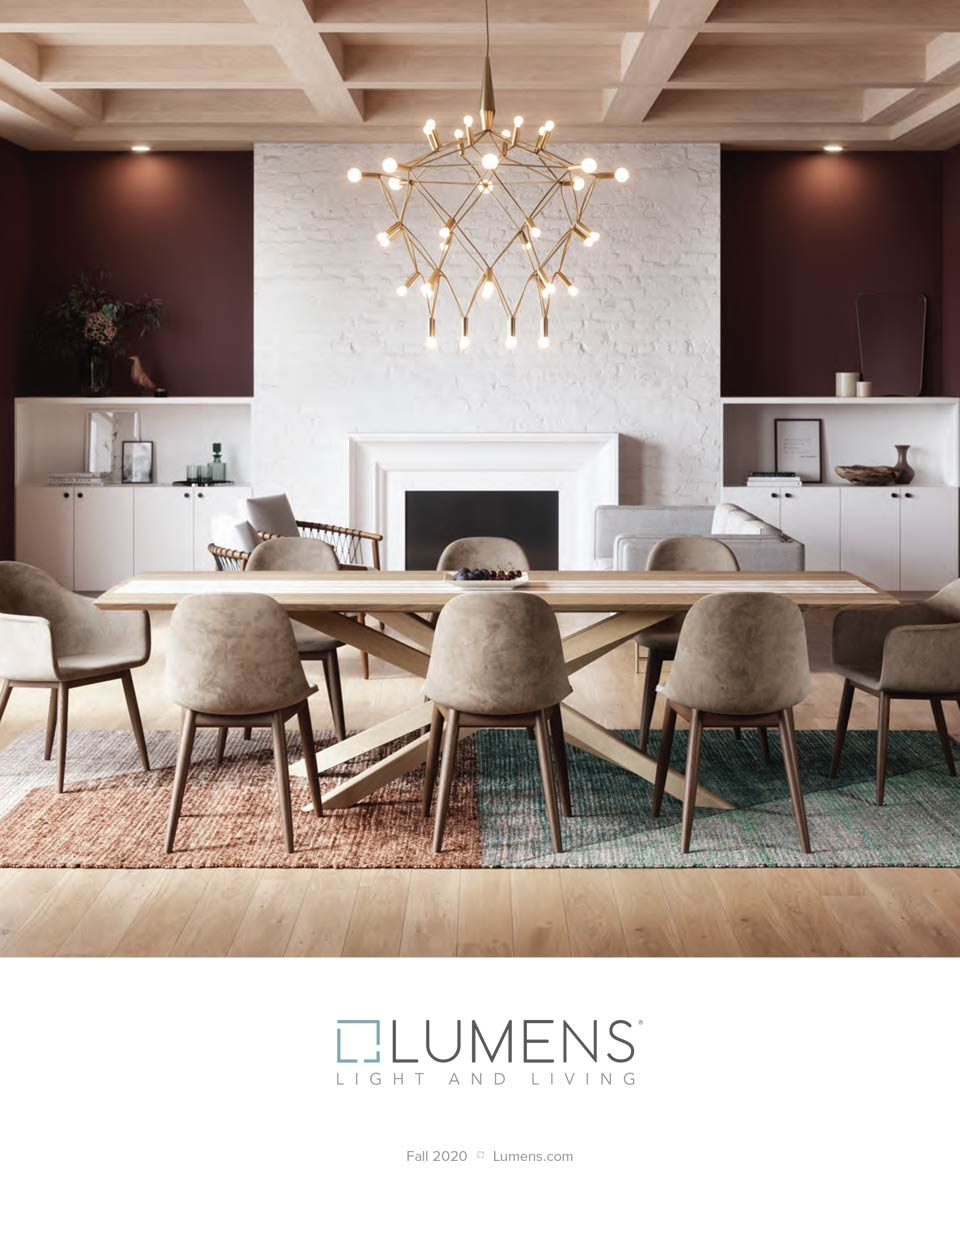 View the Lumens 2020 Fall eCatalog